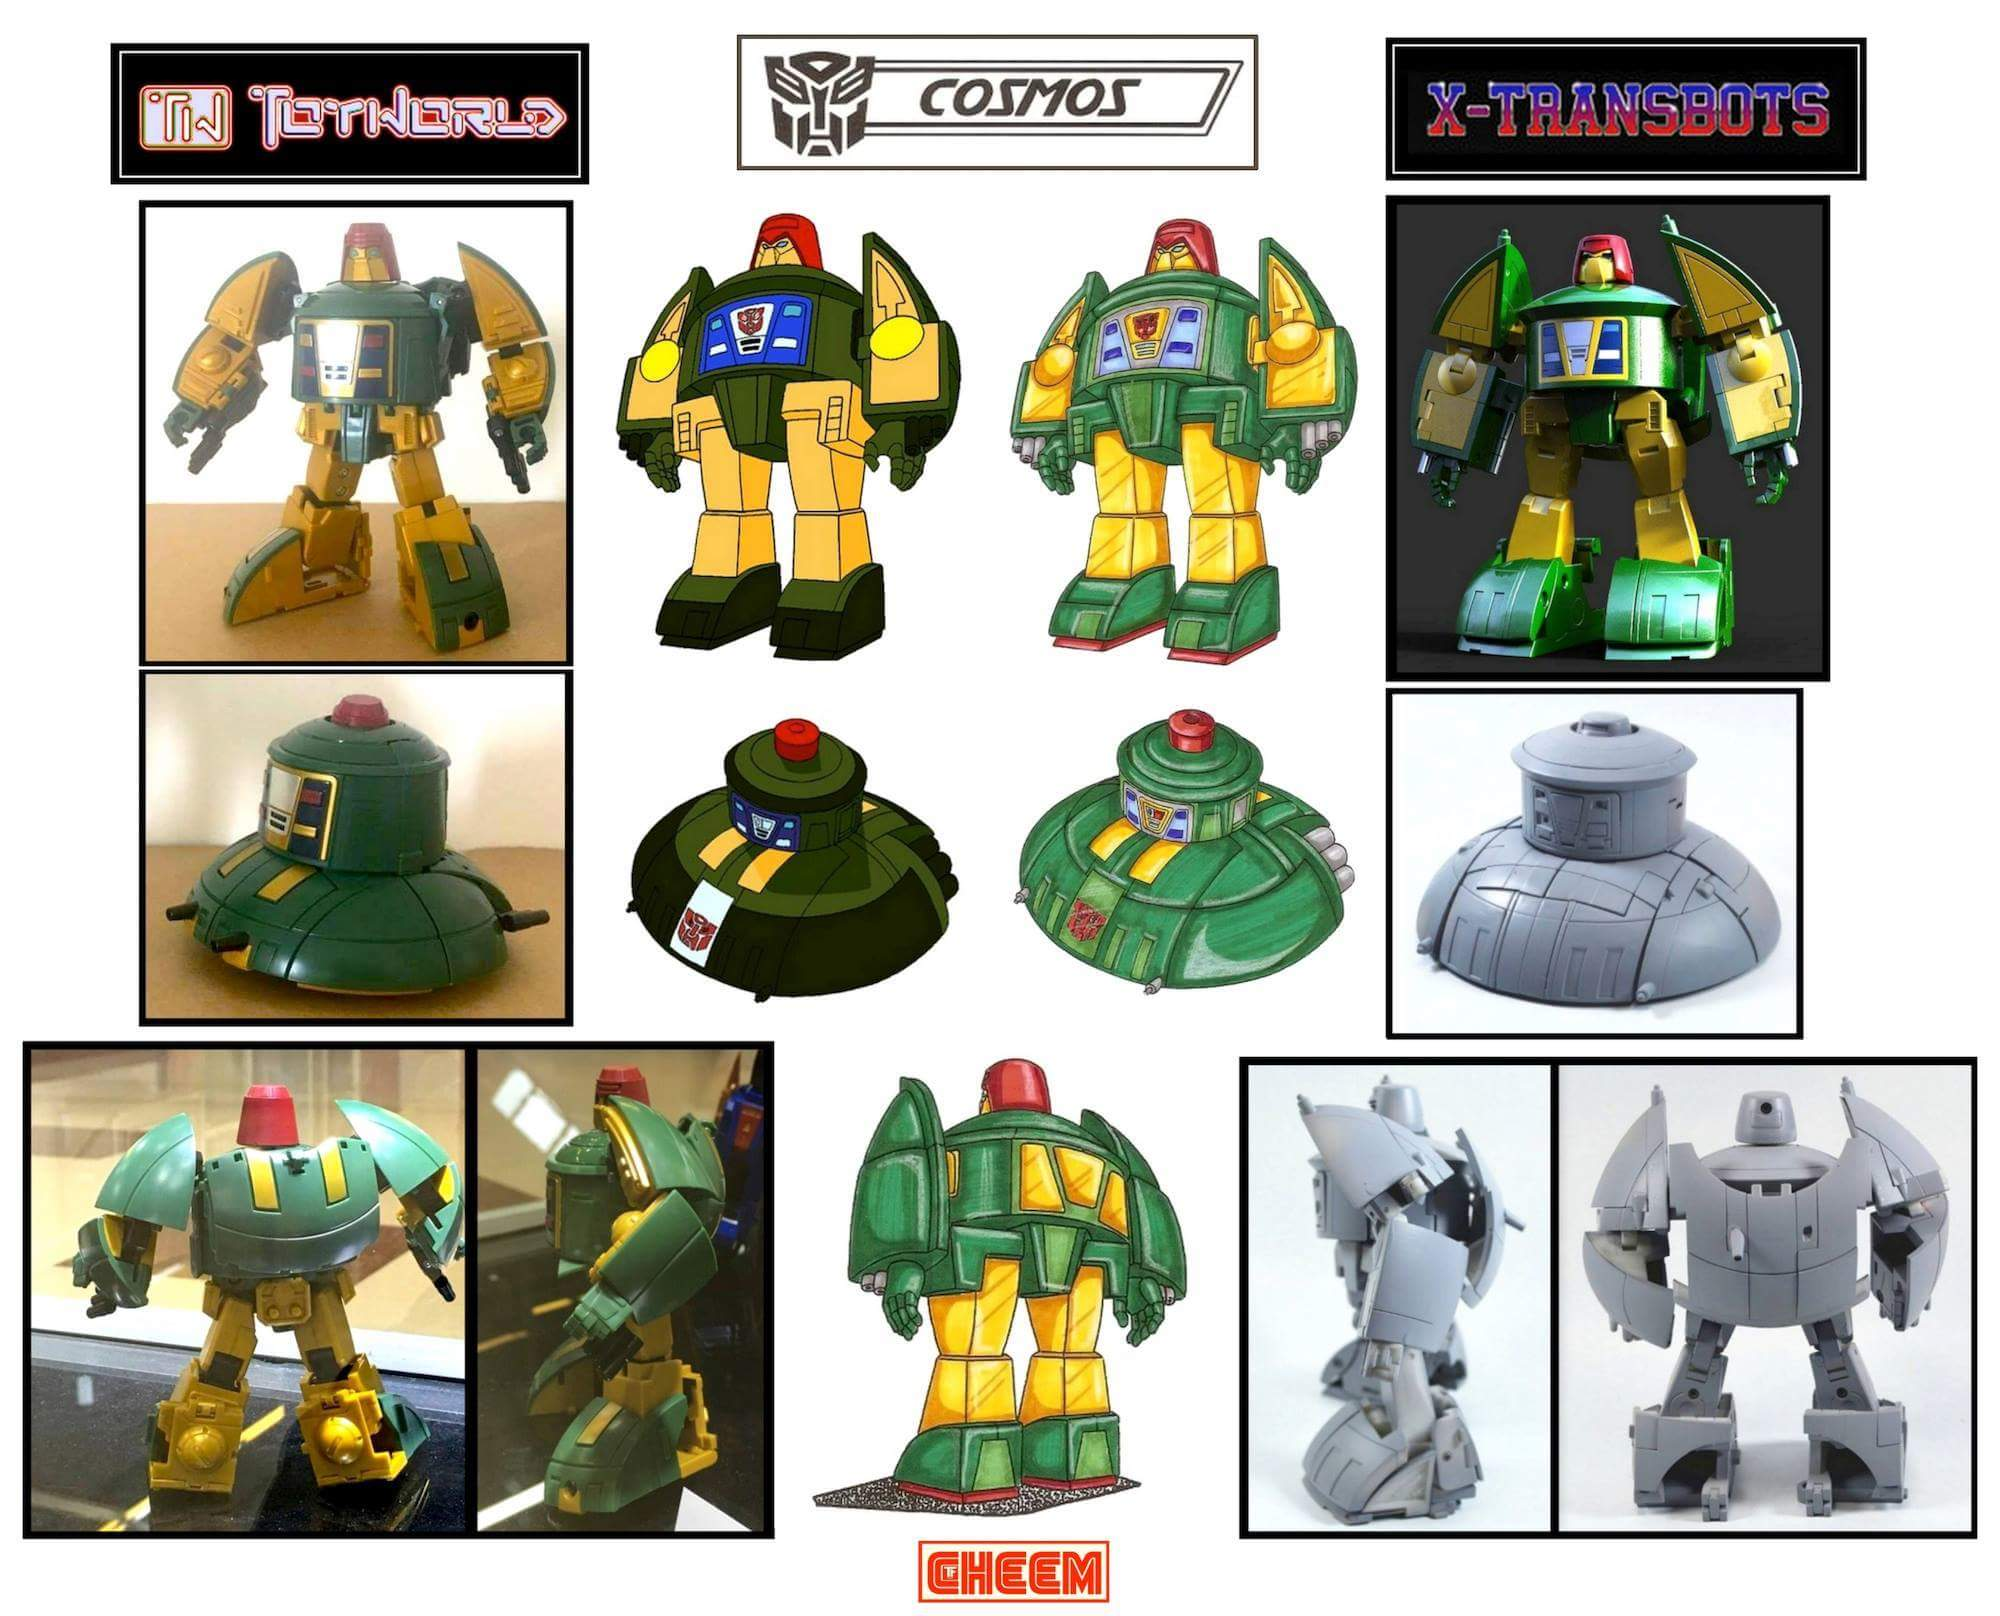 [X-Transbots] Produit Tiers - Minibots MP - Gamme MM - Page 9 00dAmhkm